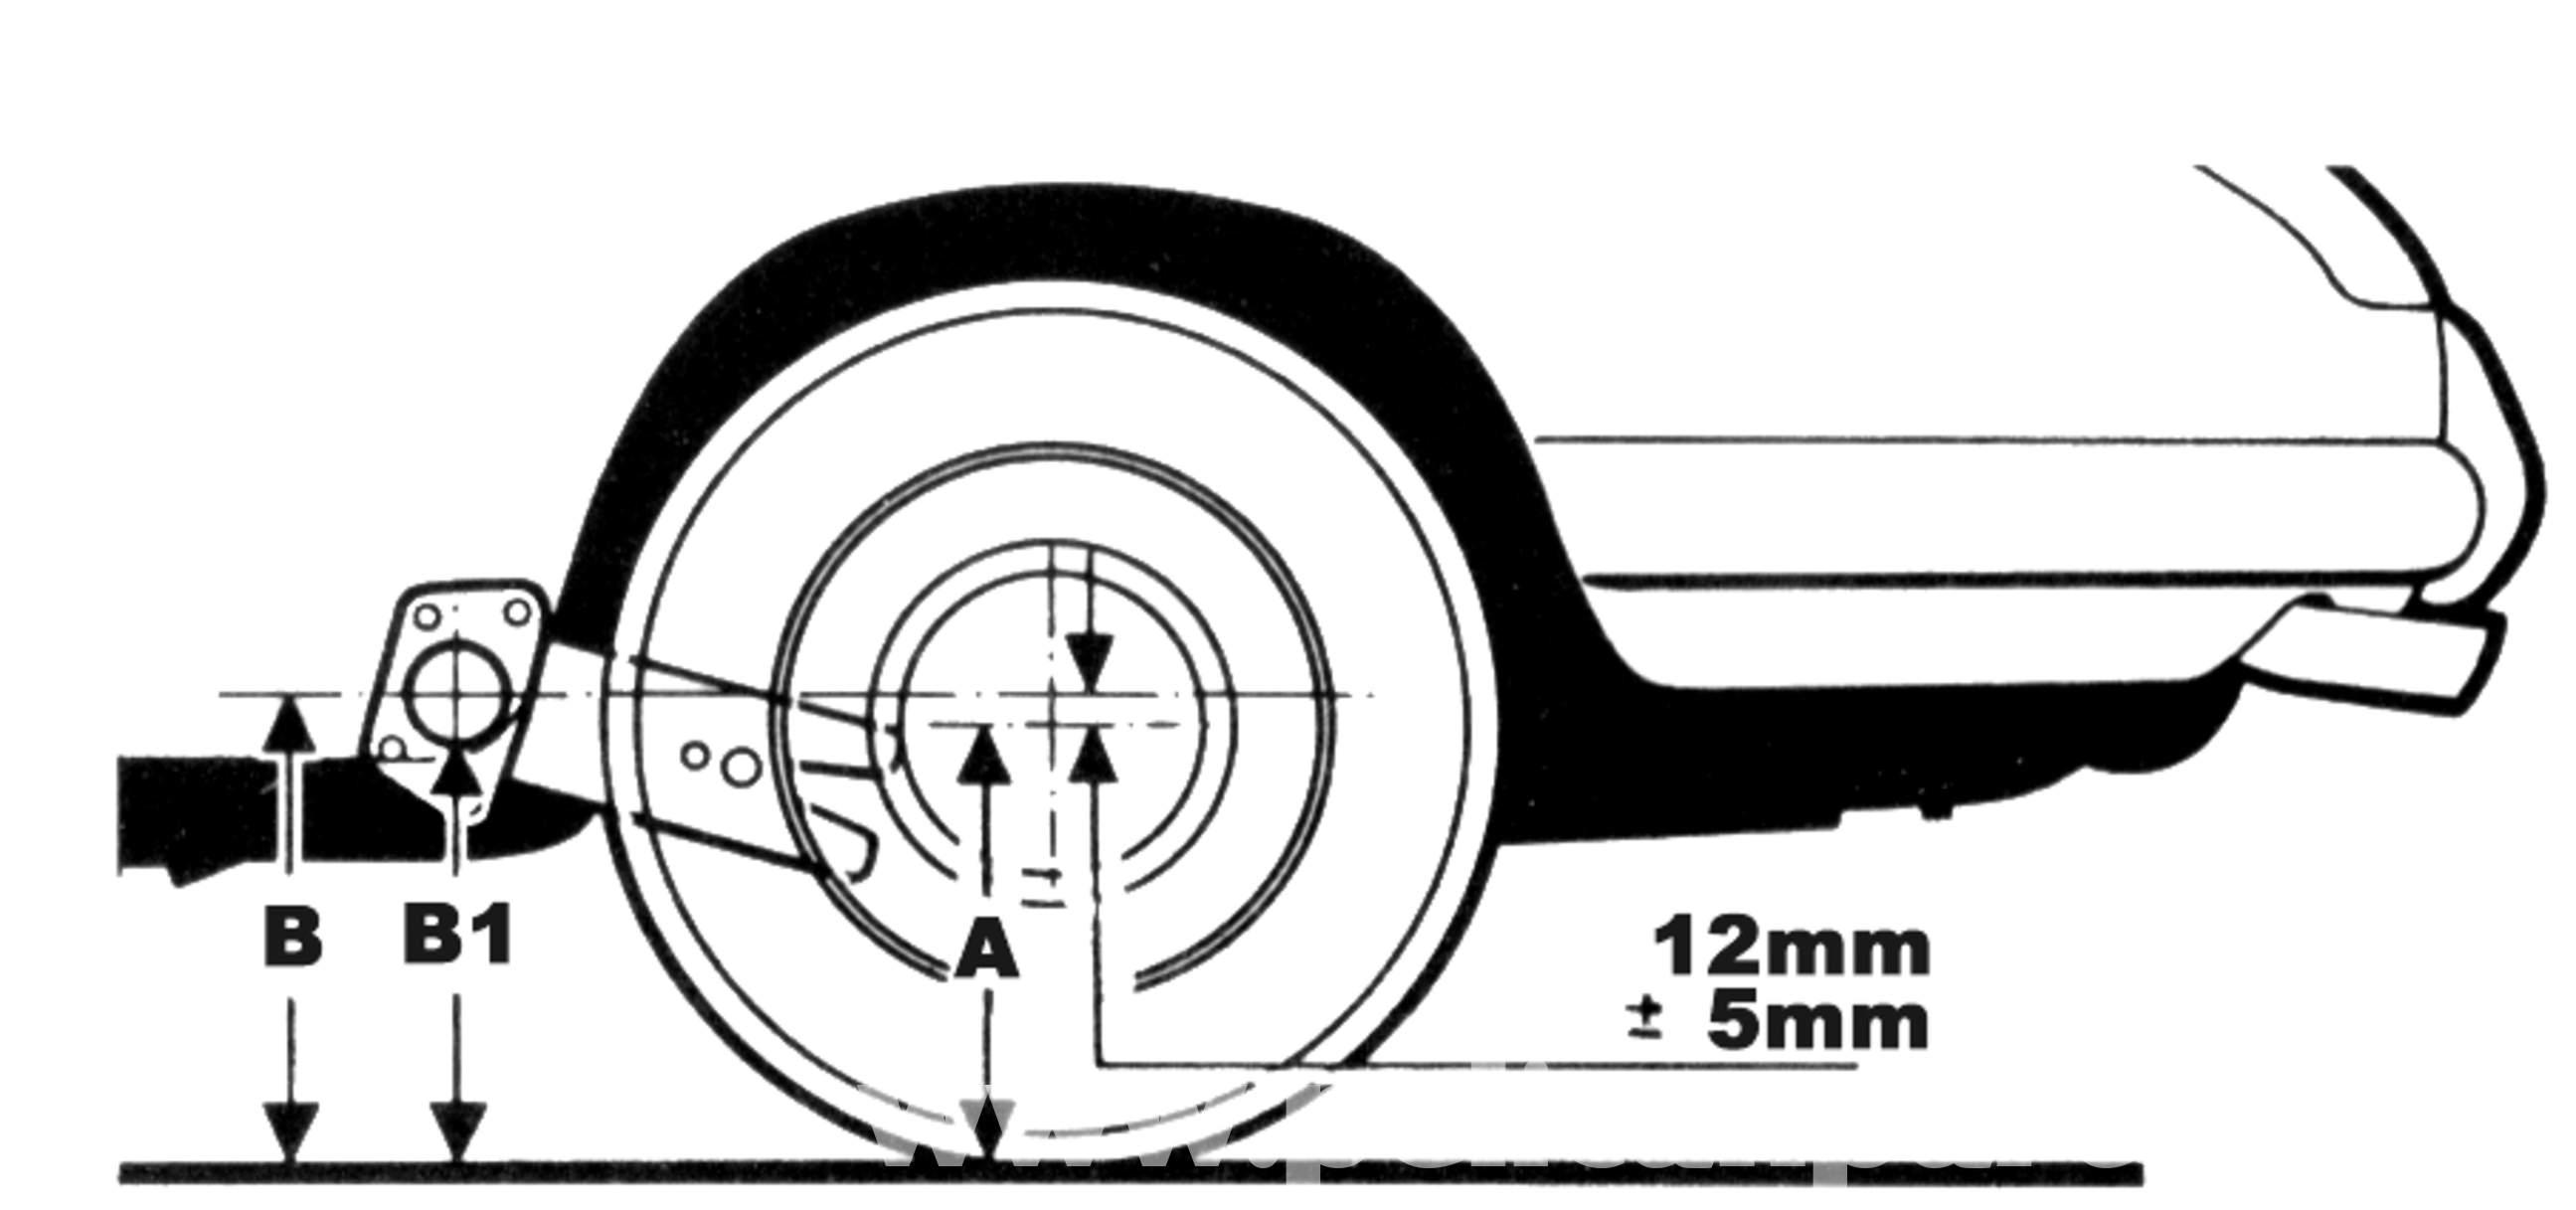 Lowering The Porsche 911 911 89